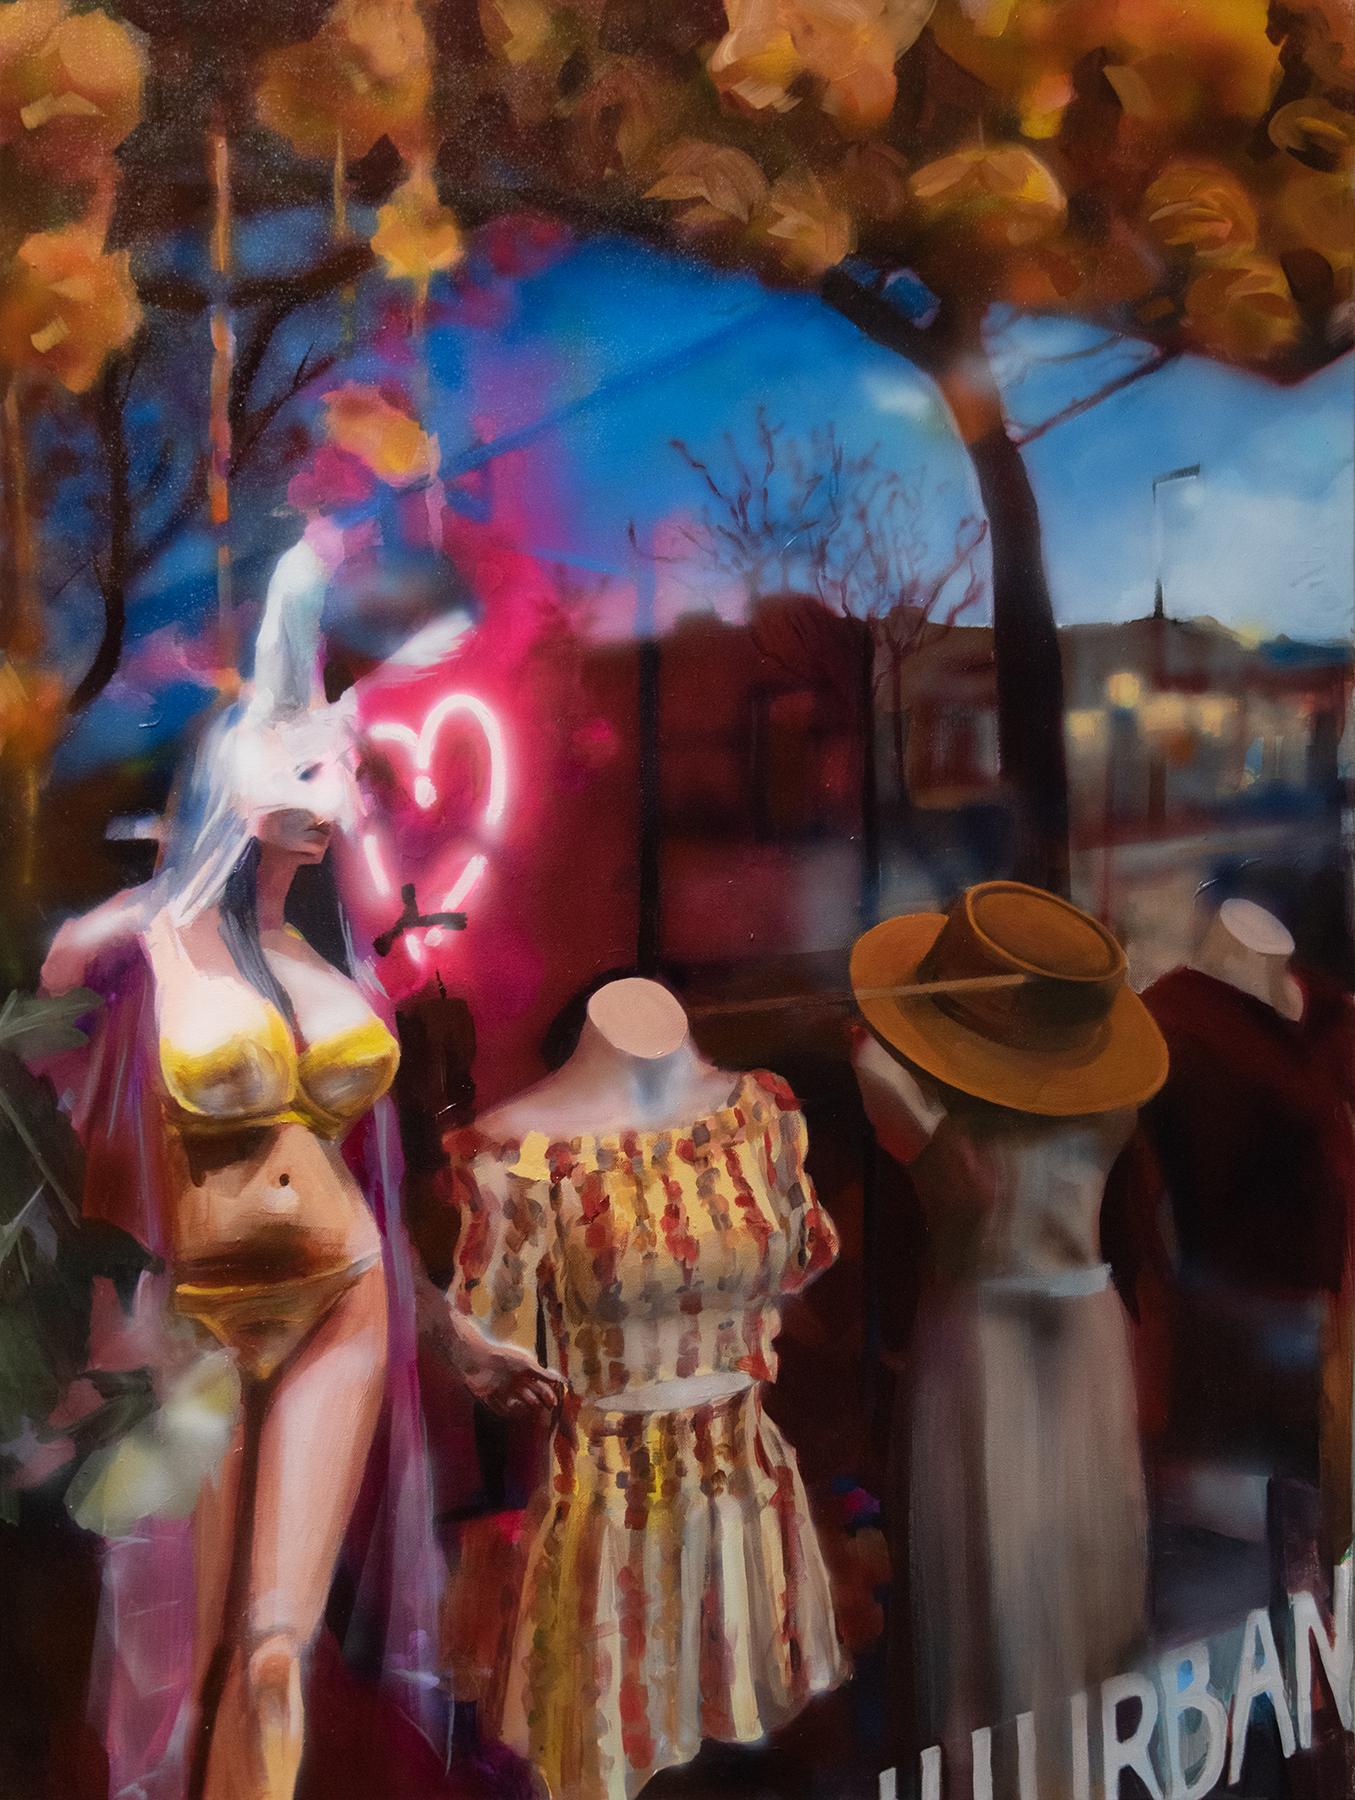 """It Lives in the Heart"", Alyssa Hood, 2019, acrylic on canvas, 40 x 30 in."